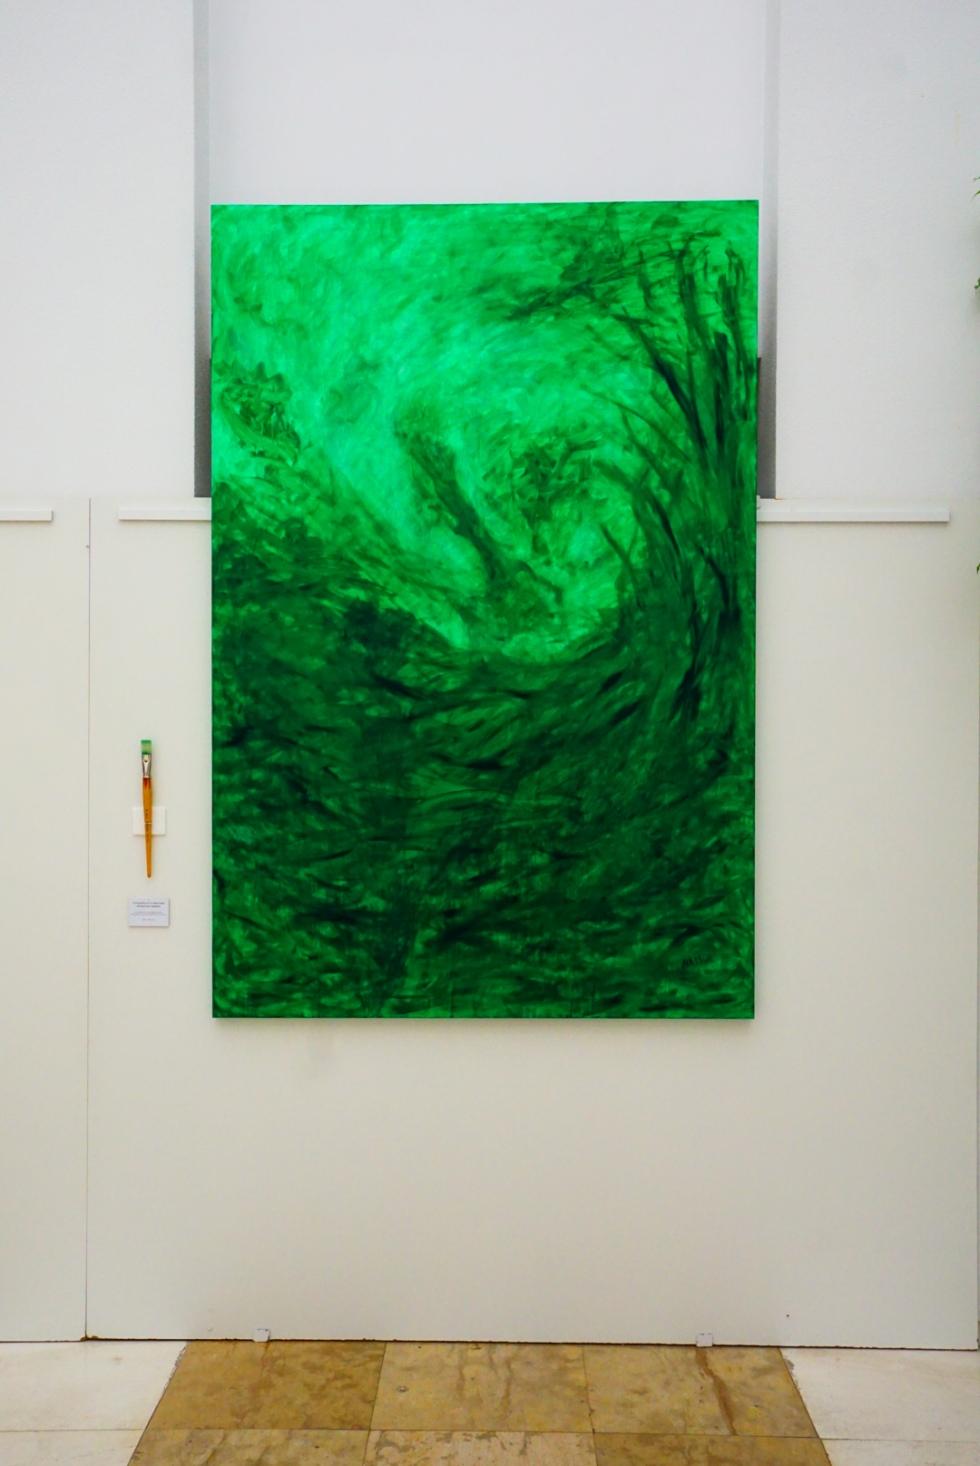 HAISUL, abstract, abstracto, essence, esssentialist, essentialism, esencialista, esencia, oil painting, óleo